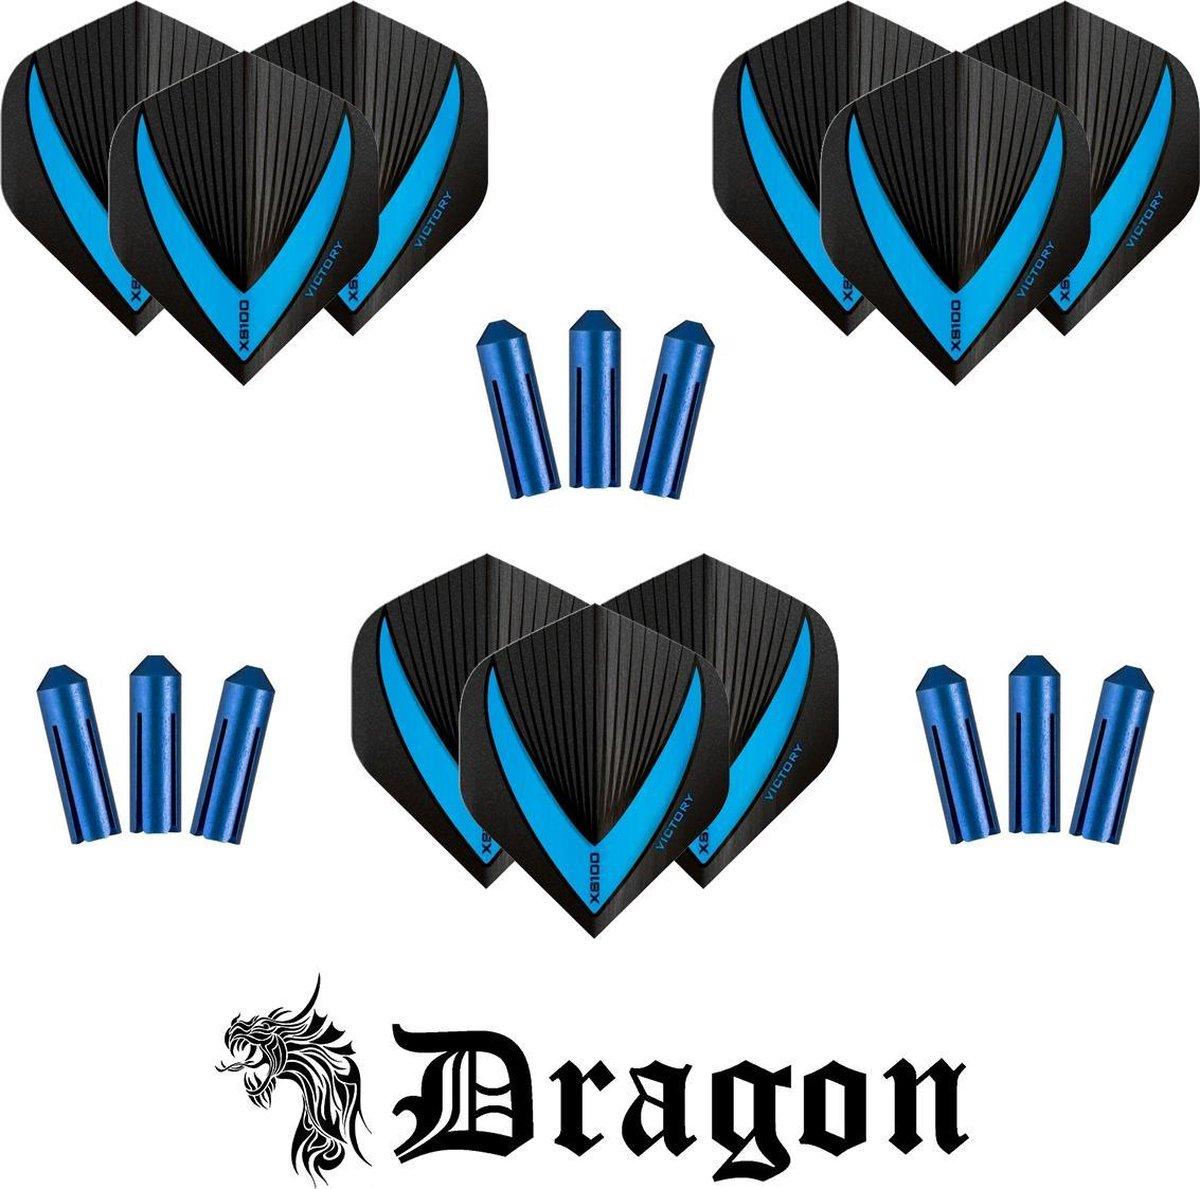 Dragon Darts - 9 stuks Vista-X - darts flights - super stevig - aqua - dartflights - dart flights - inclusief 9 stuks - flight protectors